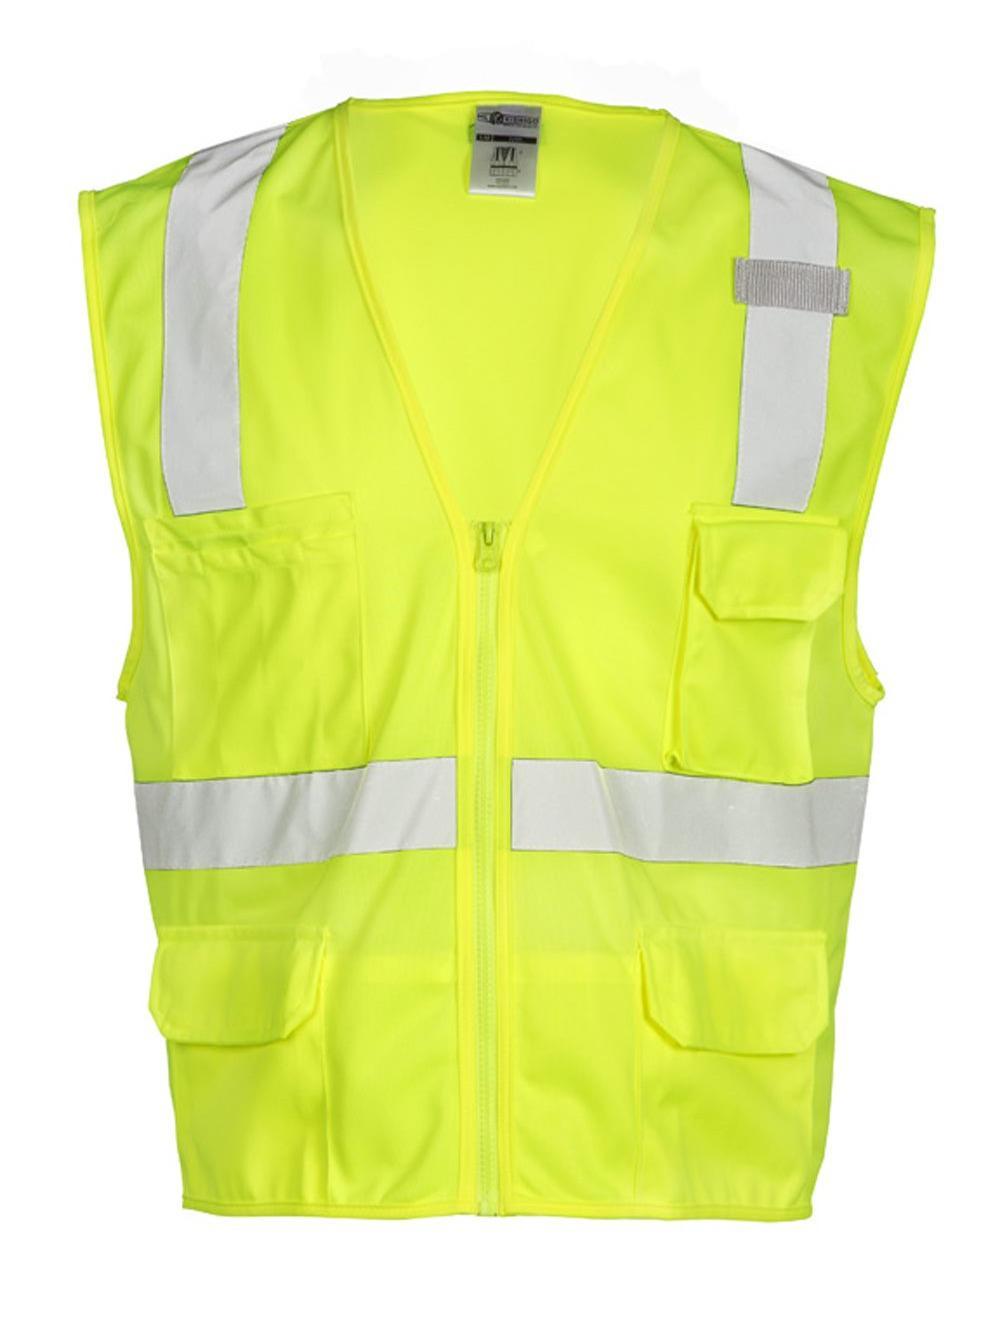 ML Kishigo 1291 6 Pocket Zipper Solid Vest